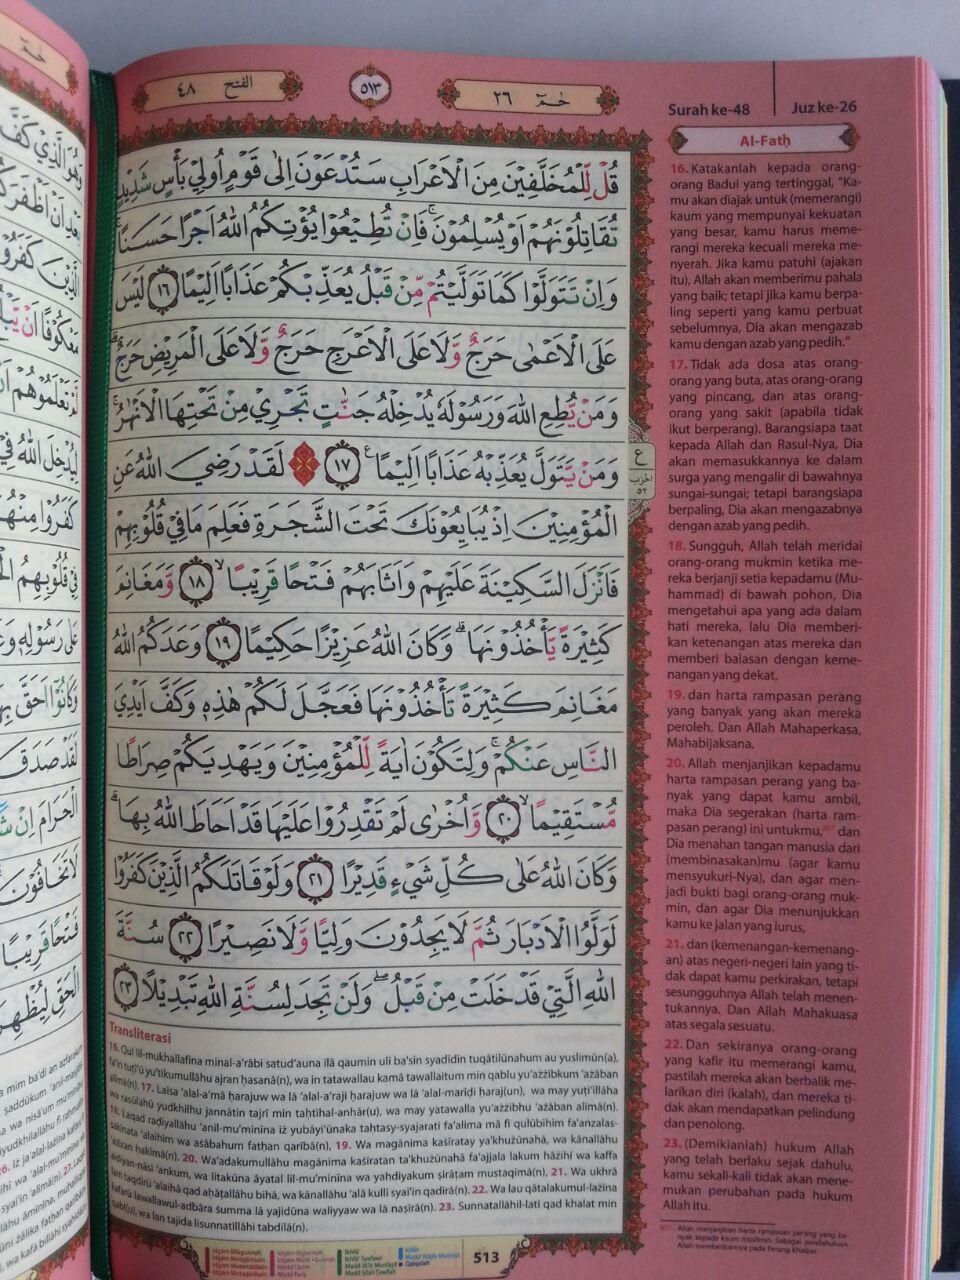 Al-Qur'an Almunawwar Tajwid Warna Transliterasi Terjemah Perayat A4 isi